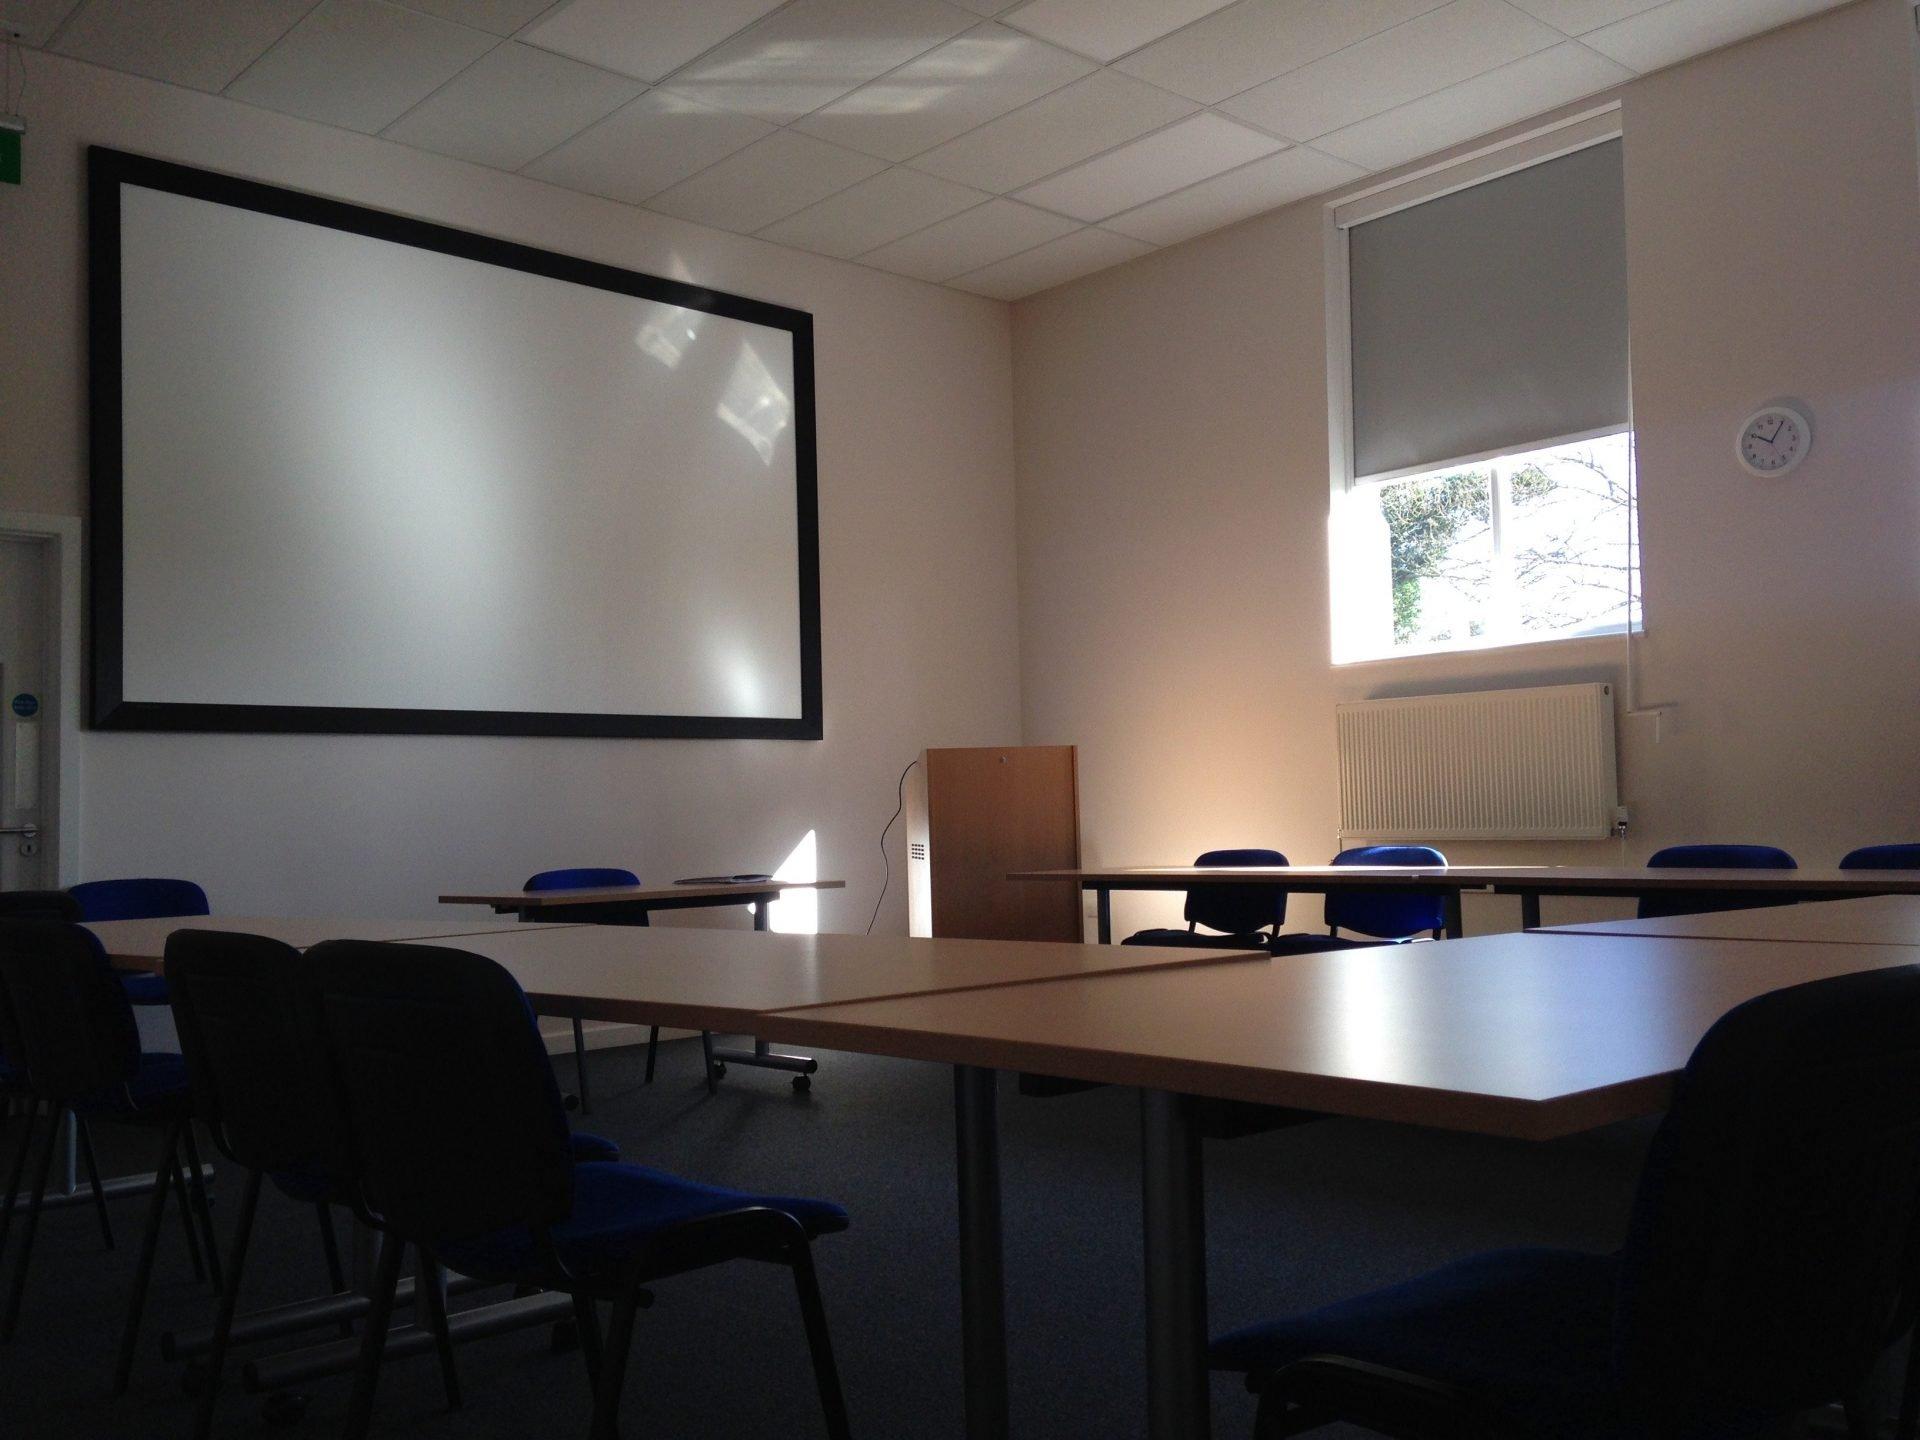 Robinson Room CHSG John Ryder Training Centre